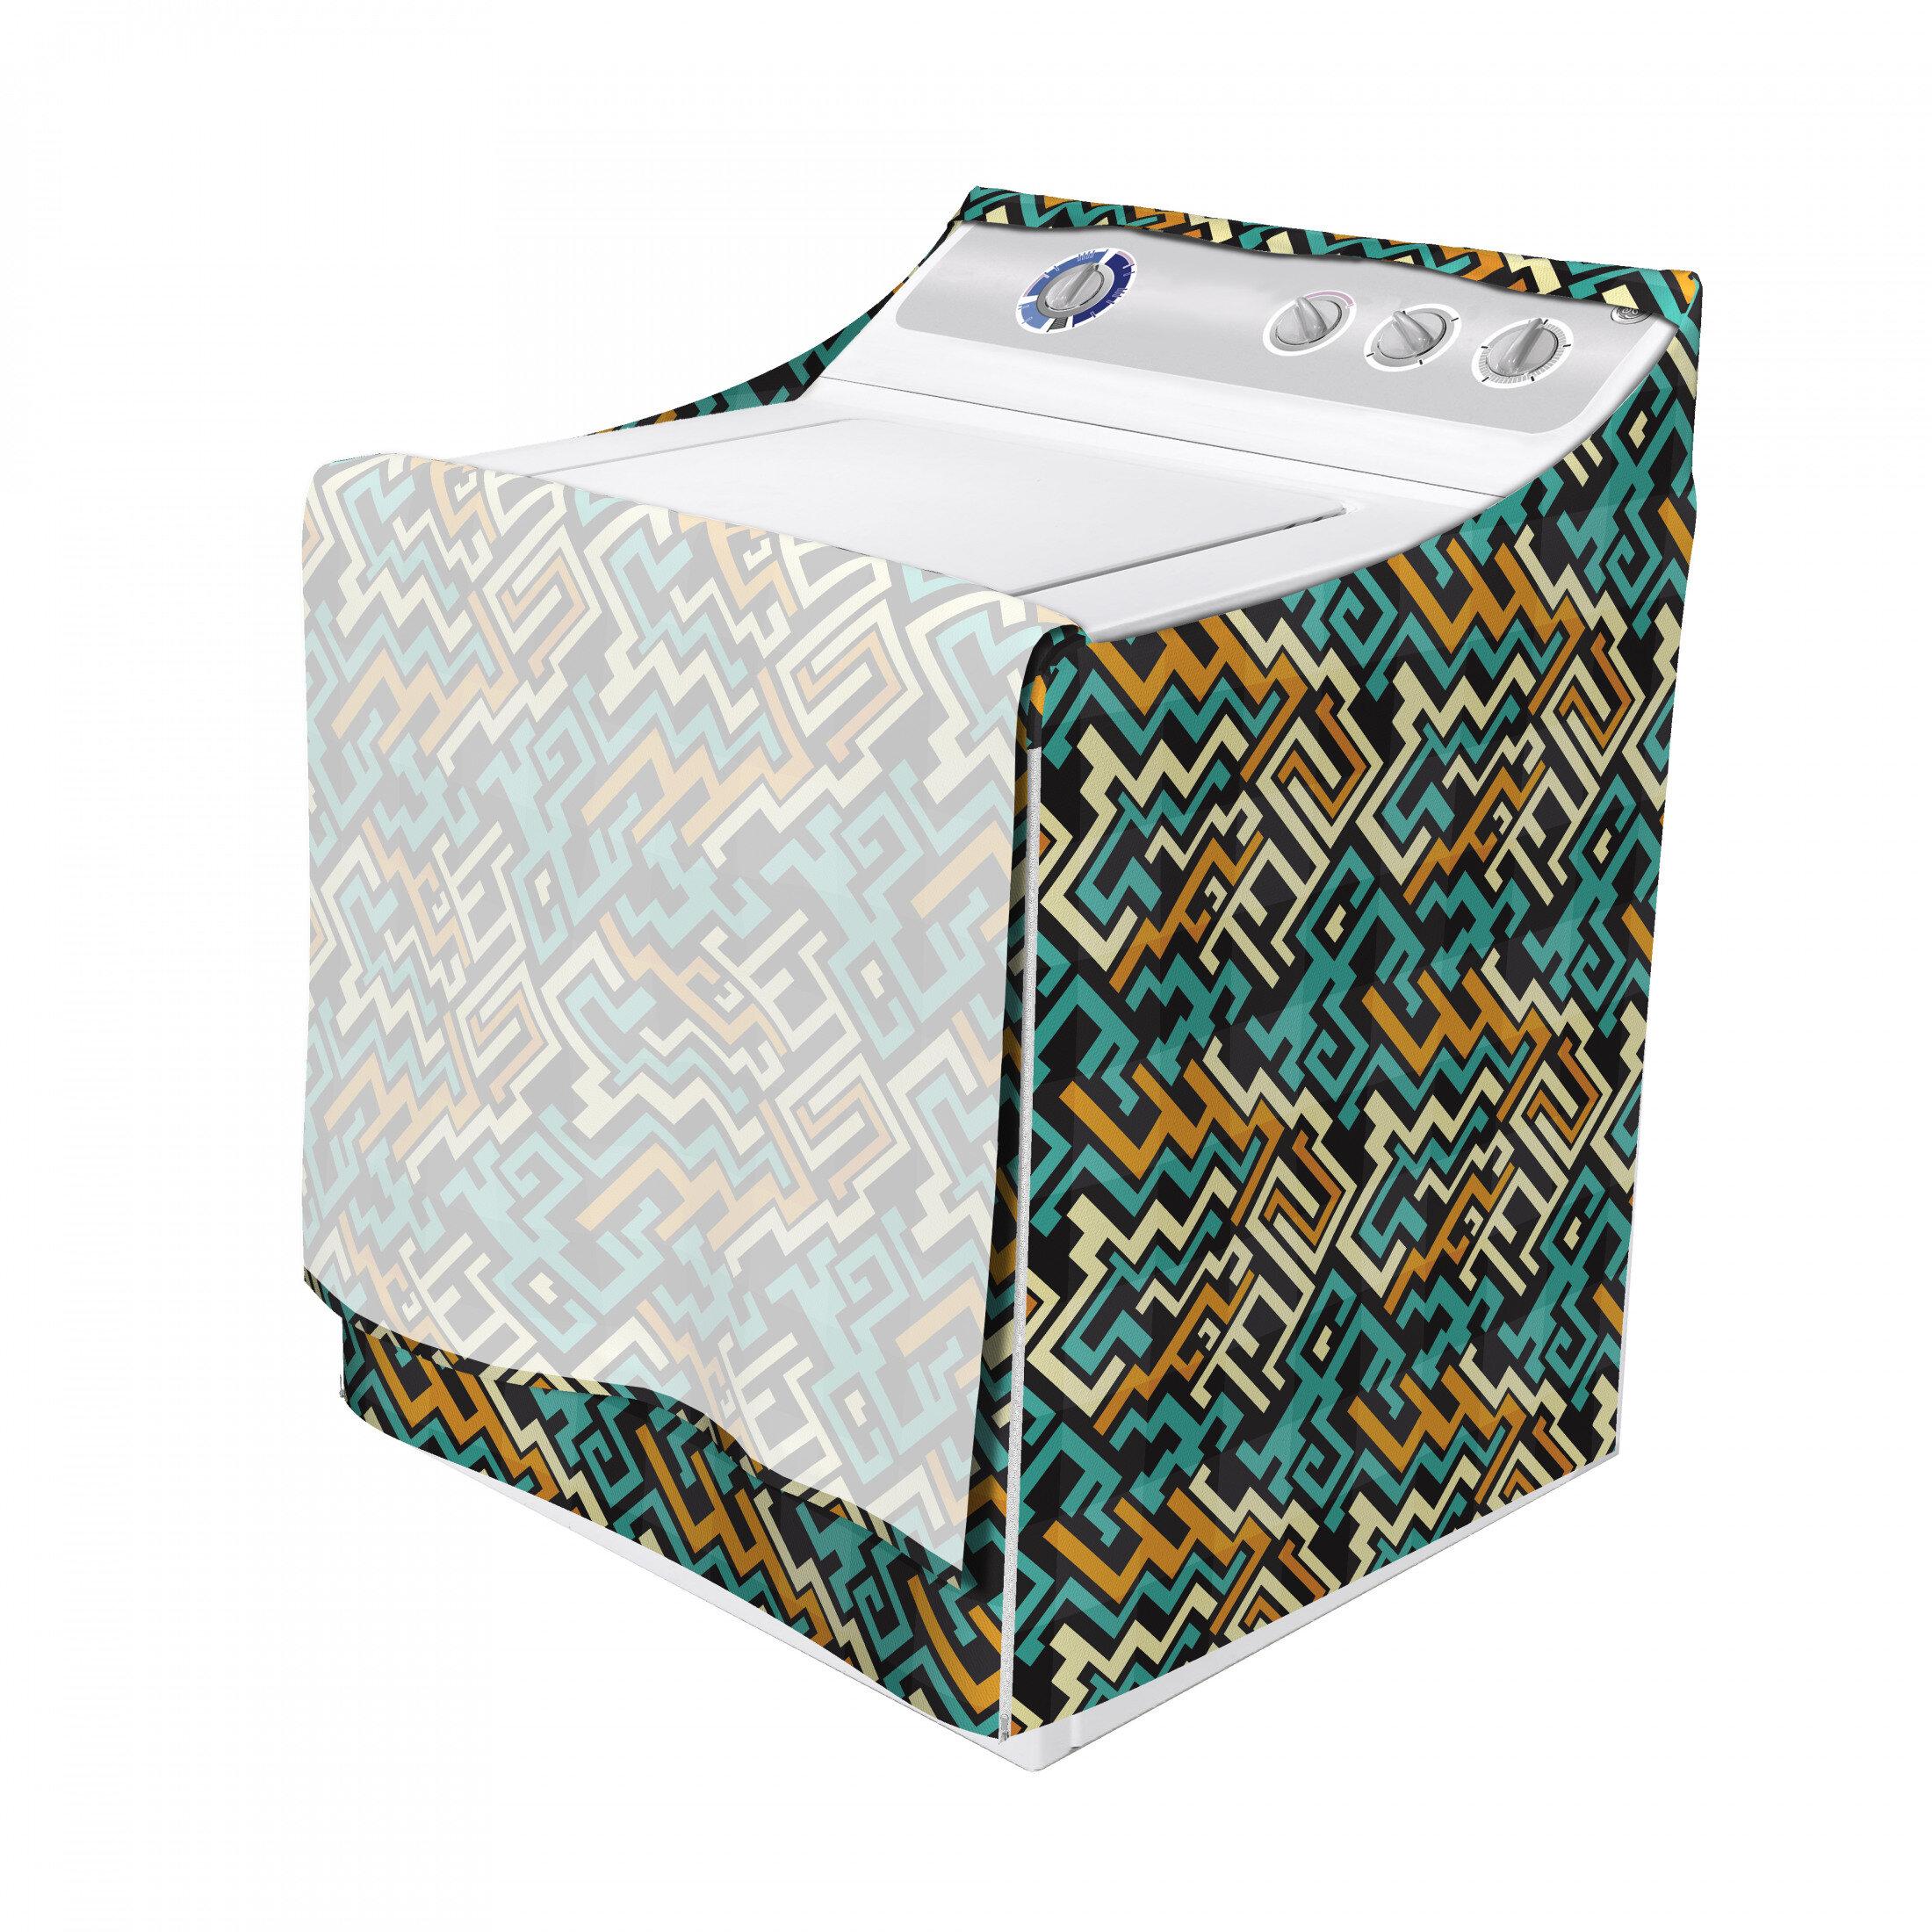 East Urban Home Abstract Modern Future Inspiration Line Art Surreal Design Washing Machine Cover Wayfair